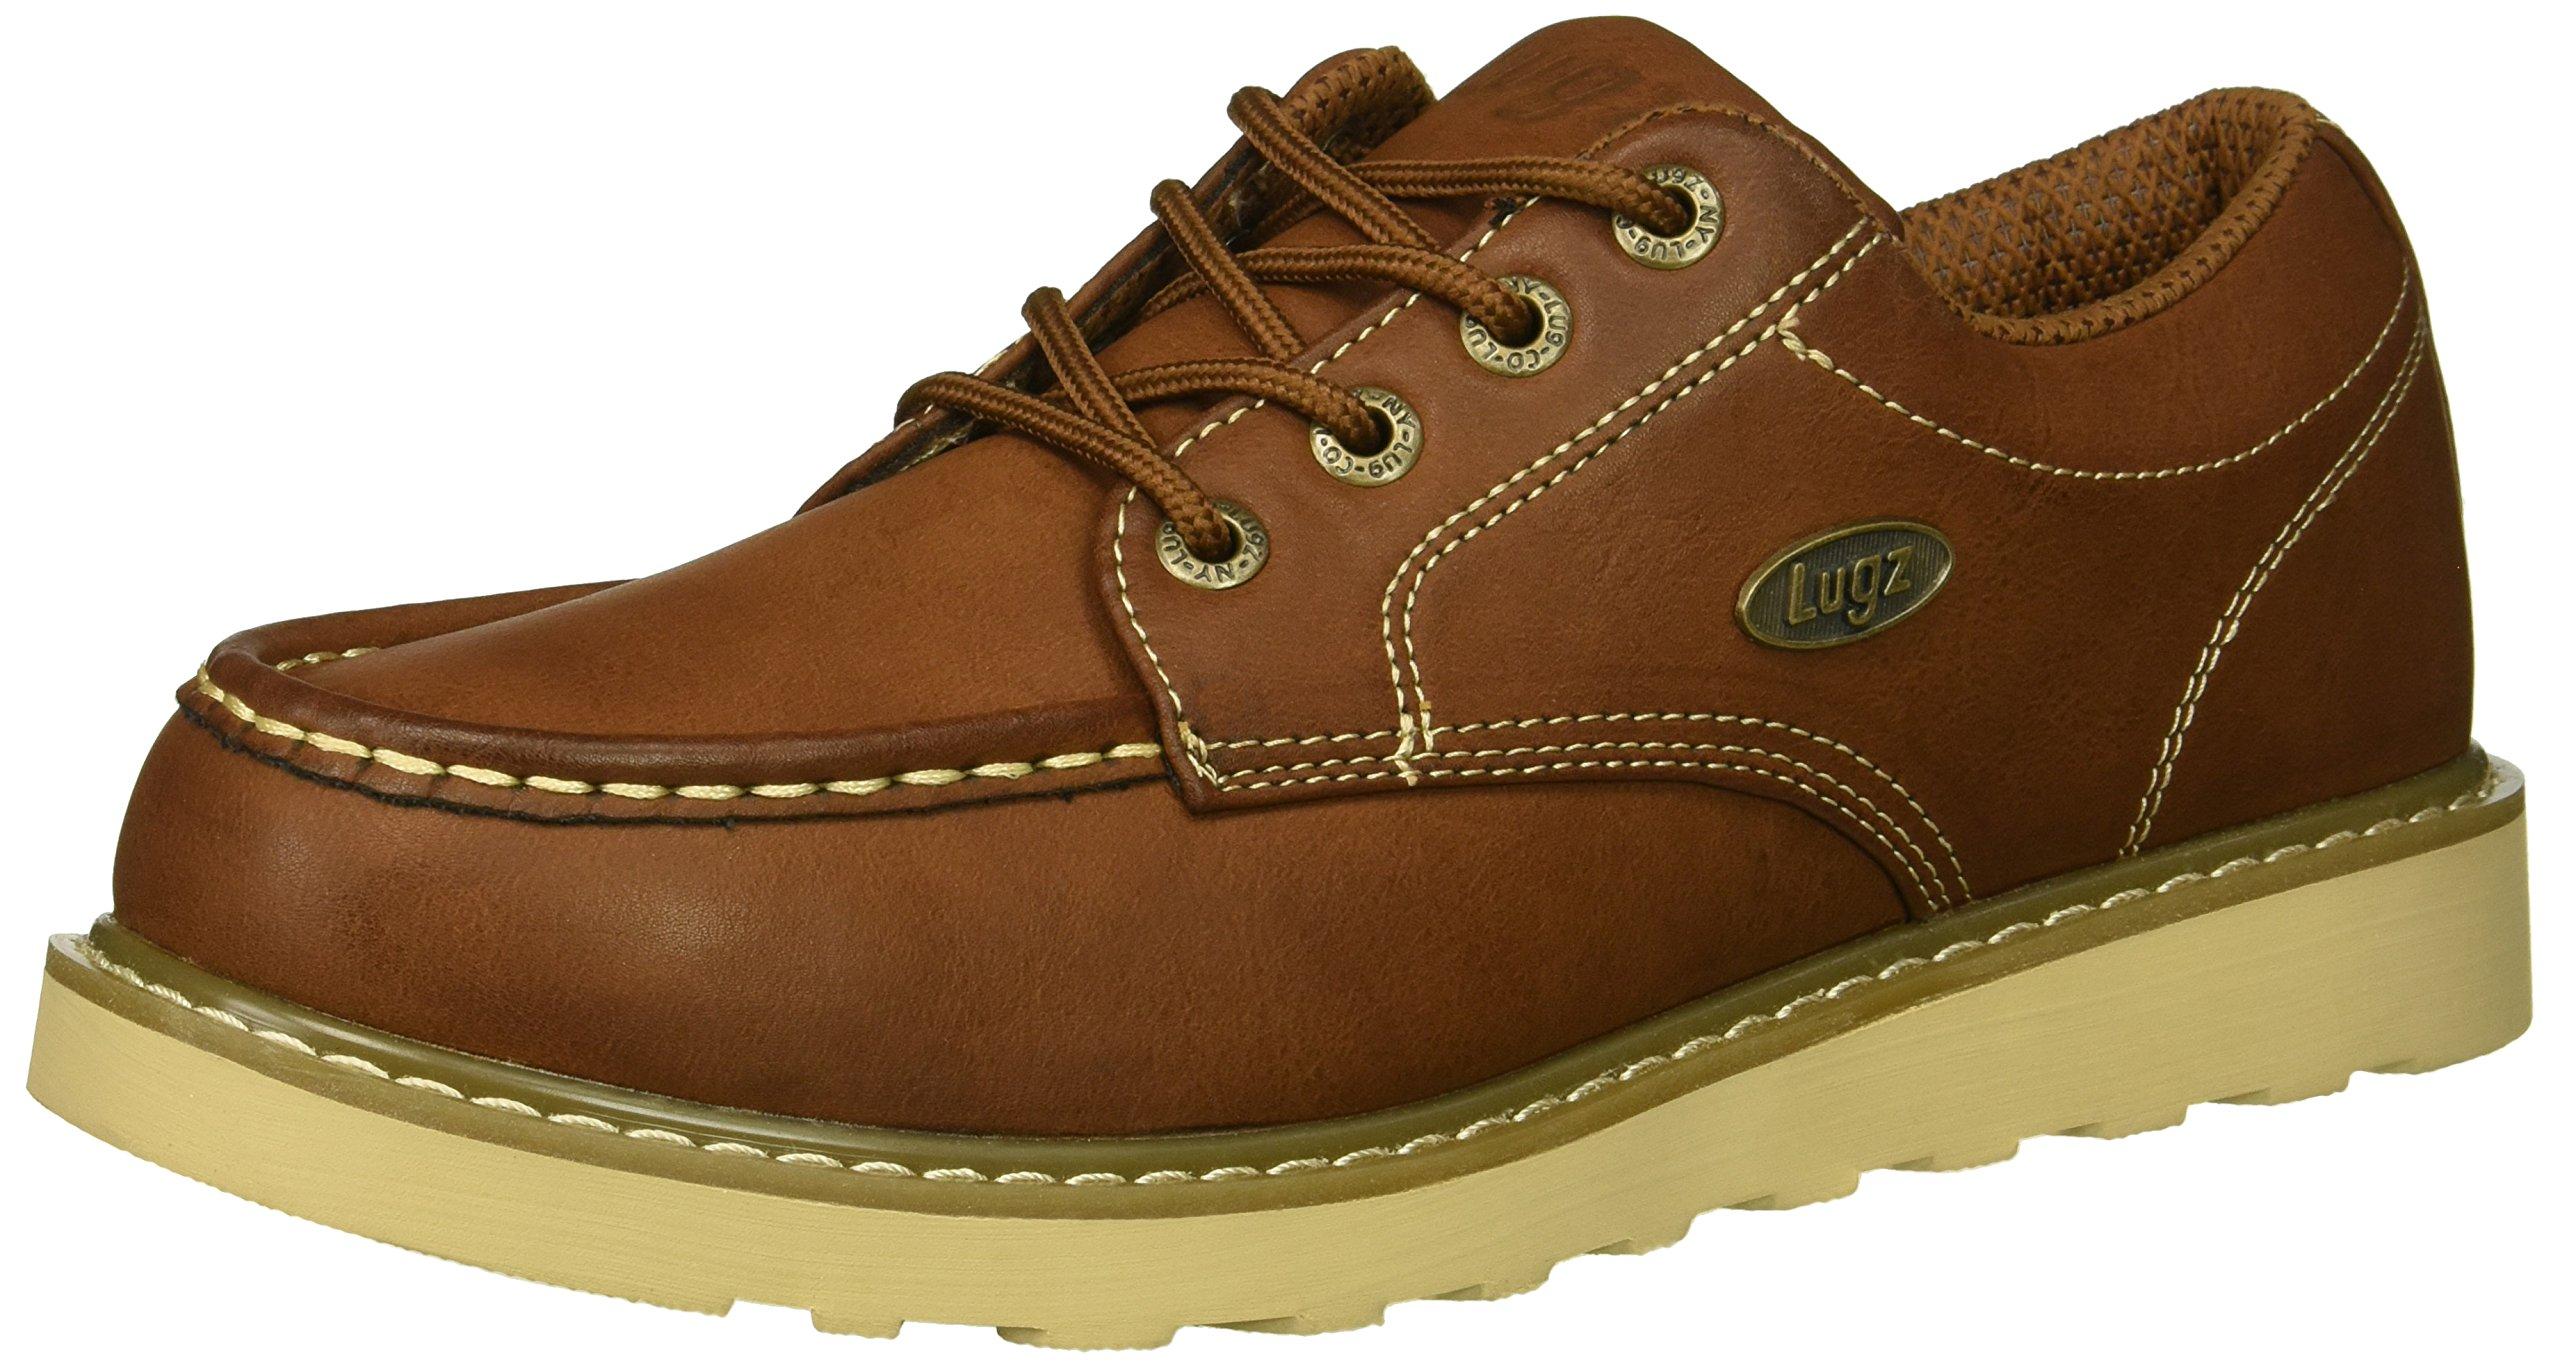 Lugz Men's Roamer Lo Oxford Boot, Dark Brown/Gum/Cream, 10 D US